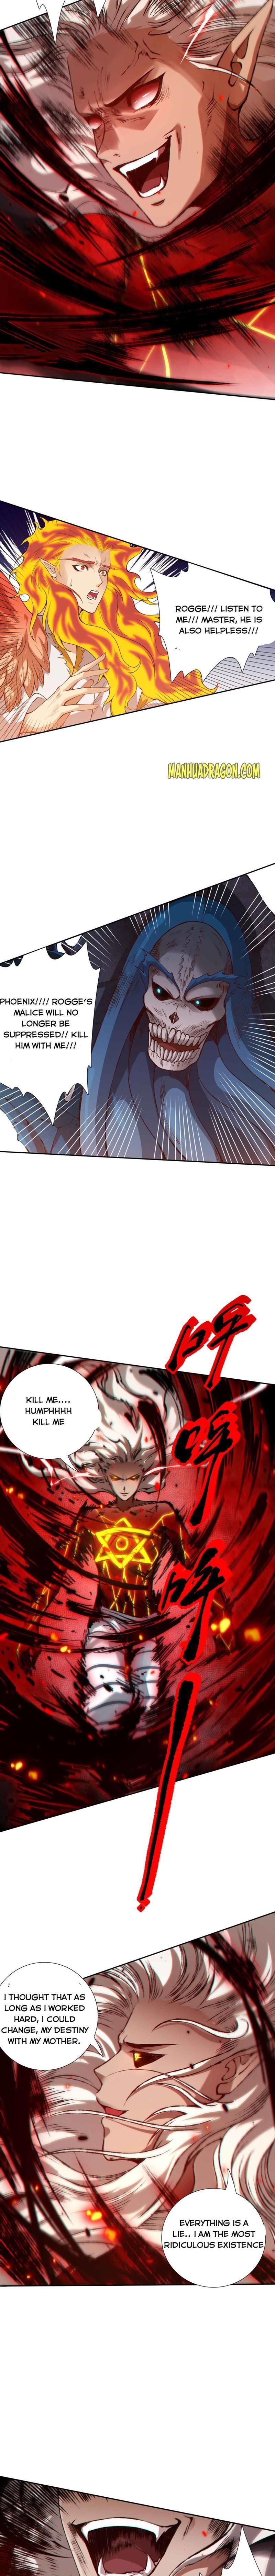 Ultimate Soldier Chapter 119 page 11 - Mangakakalots.com